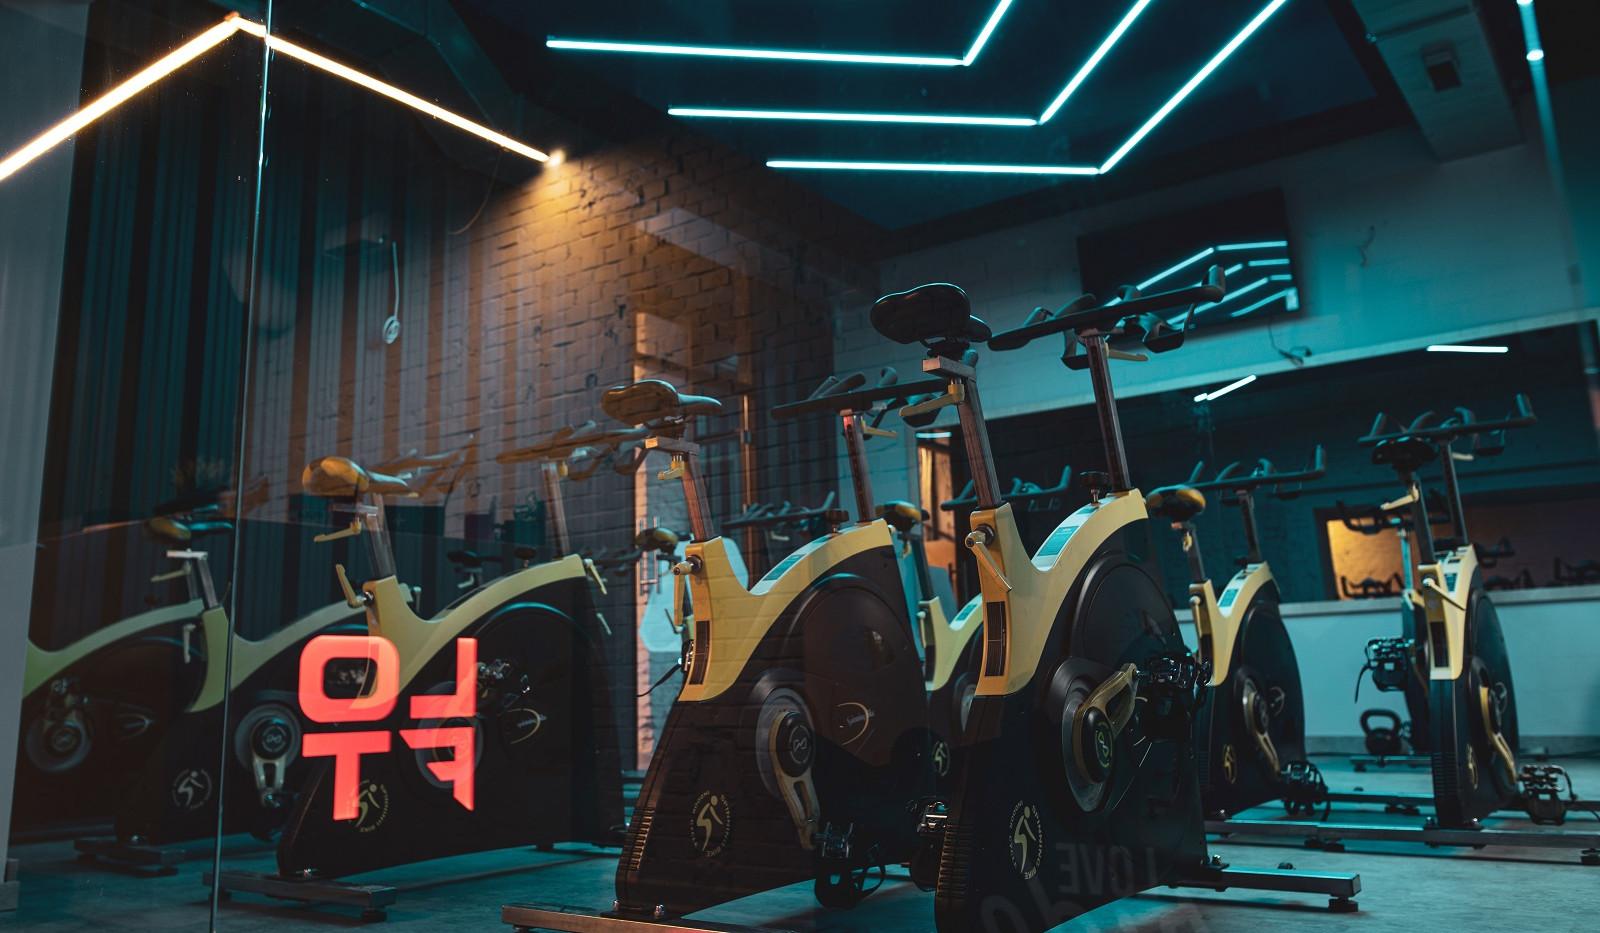 loft_1_cycling.jpg